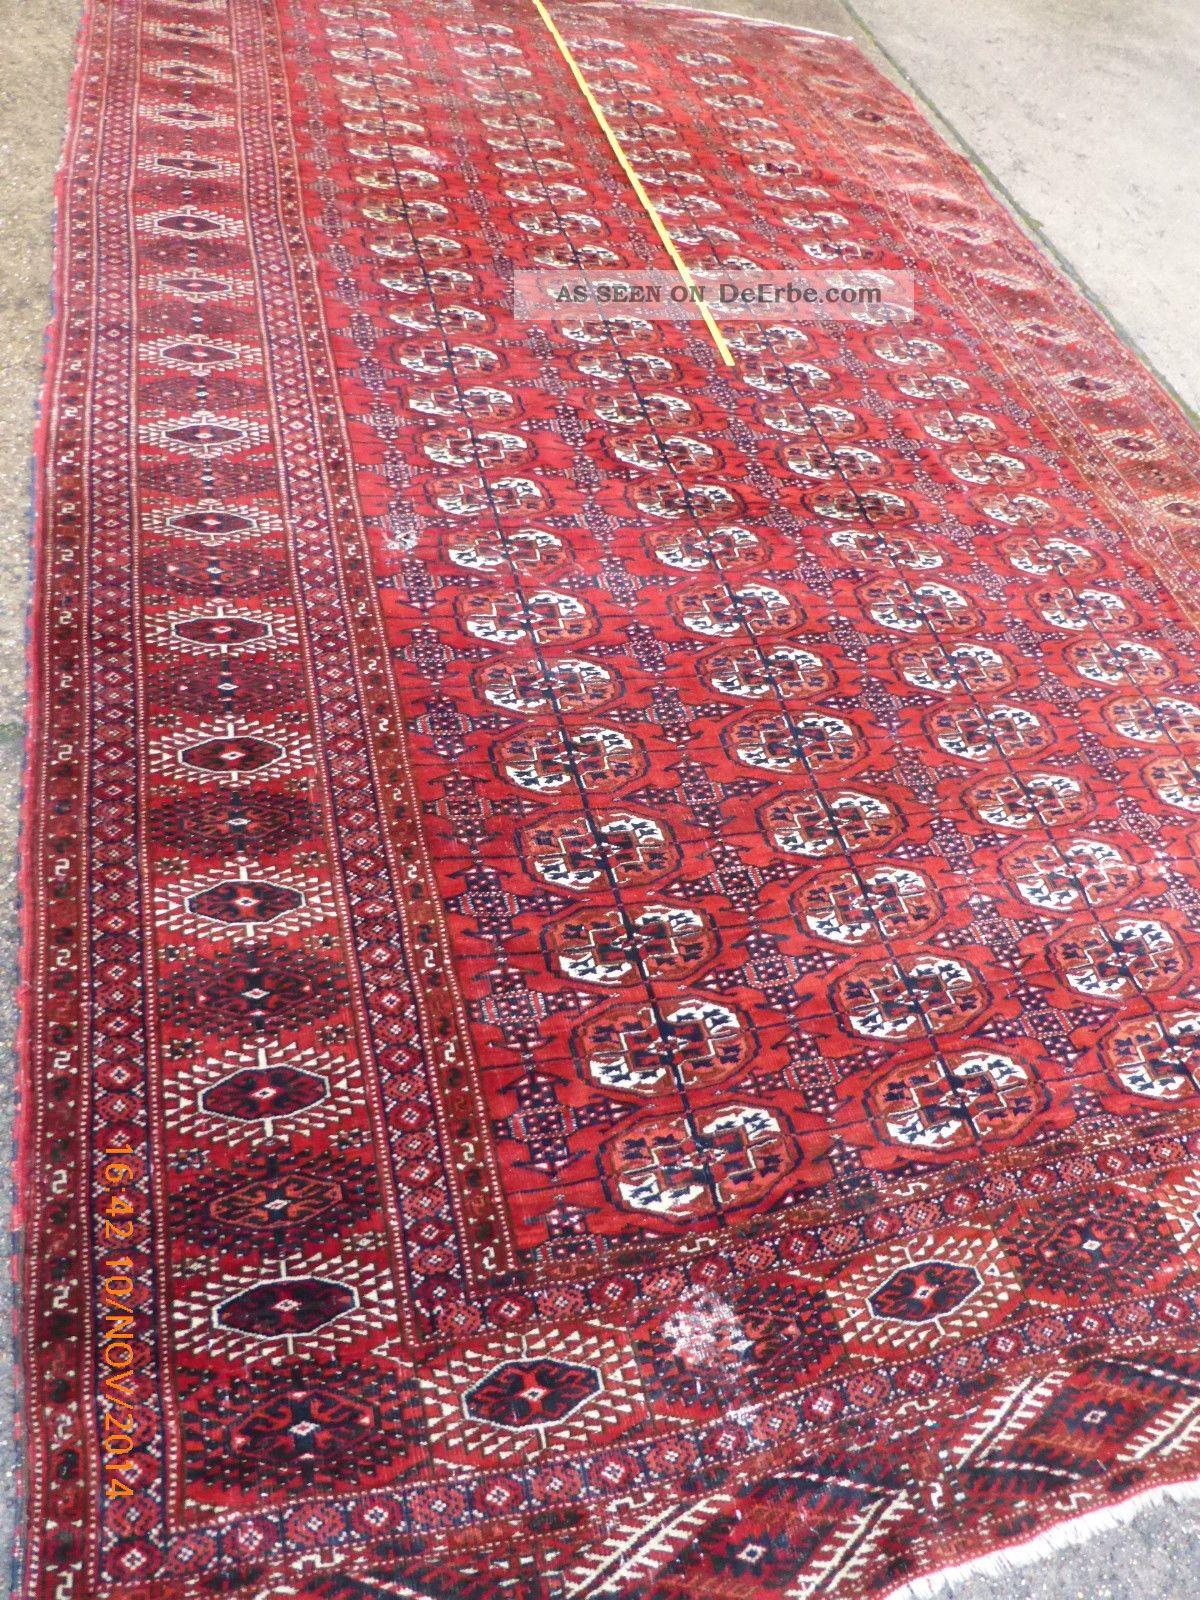 Xxl Antiker Orient Teppich Teke Buhara?turkman? 391cm